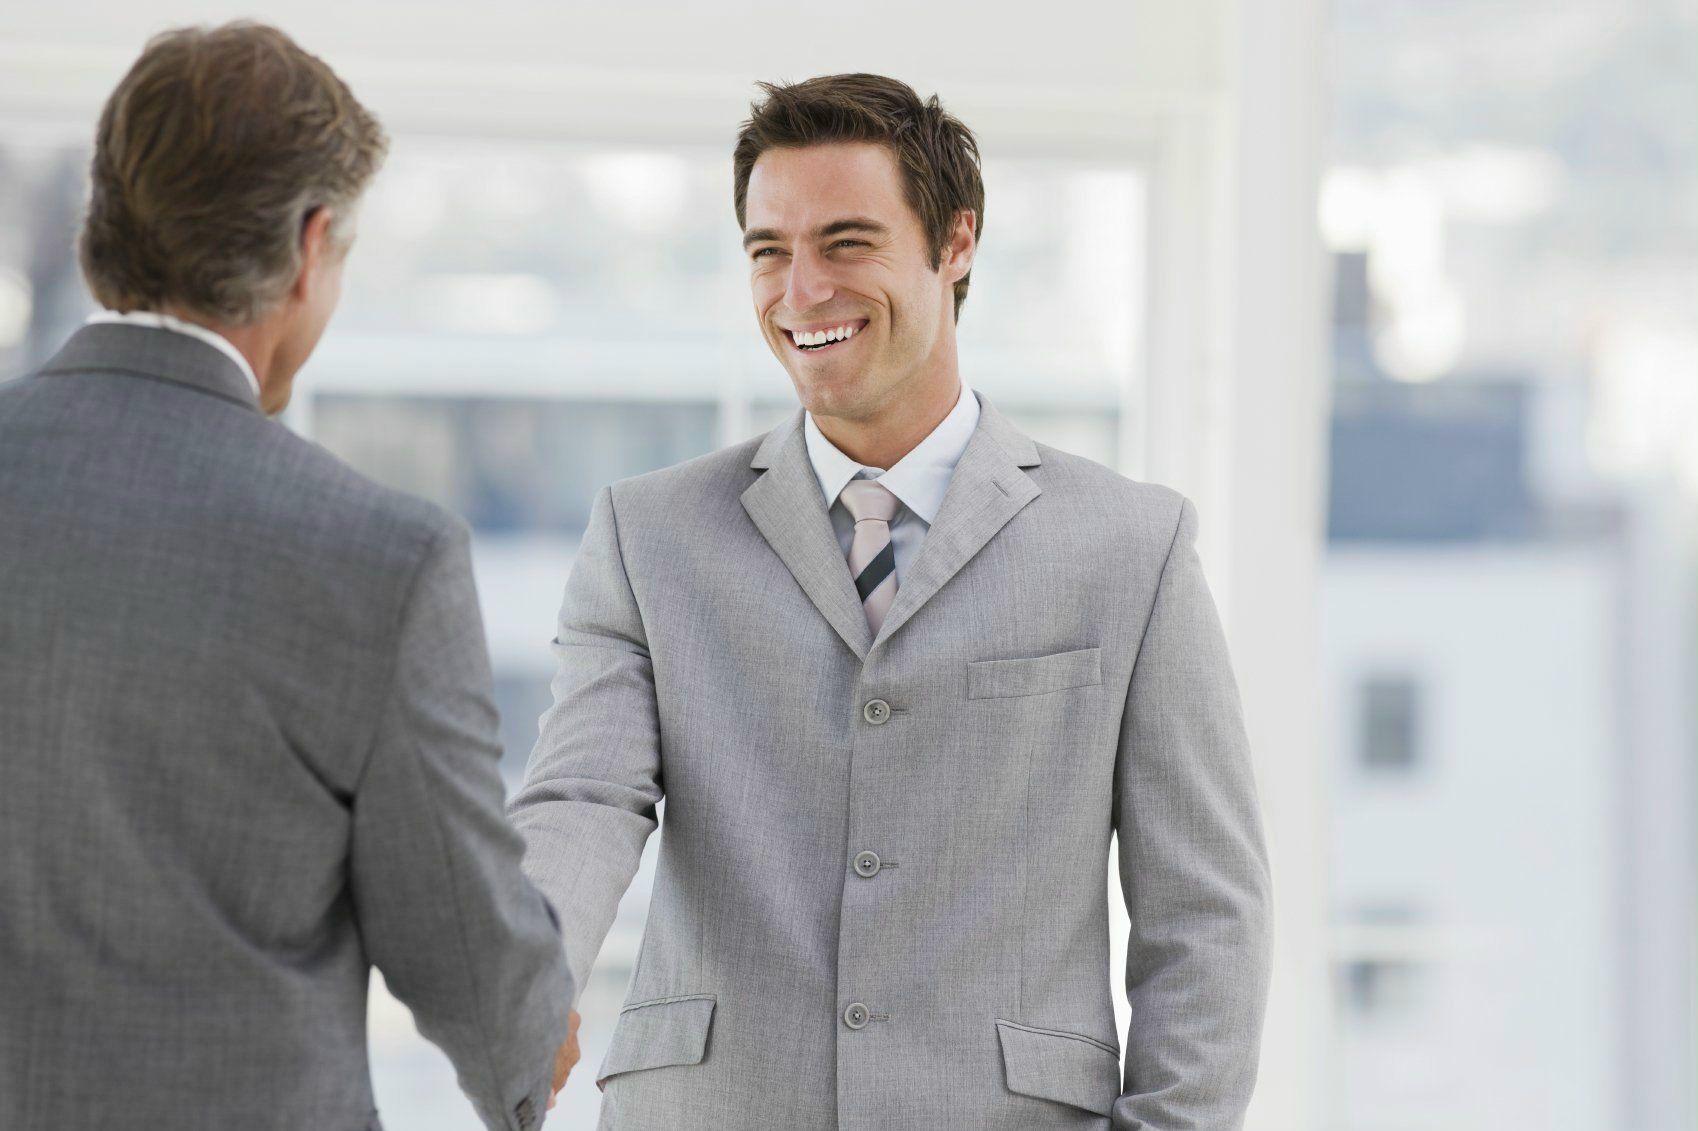 businessmen-handshake-business